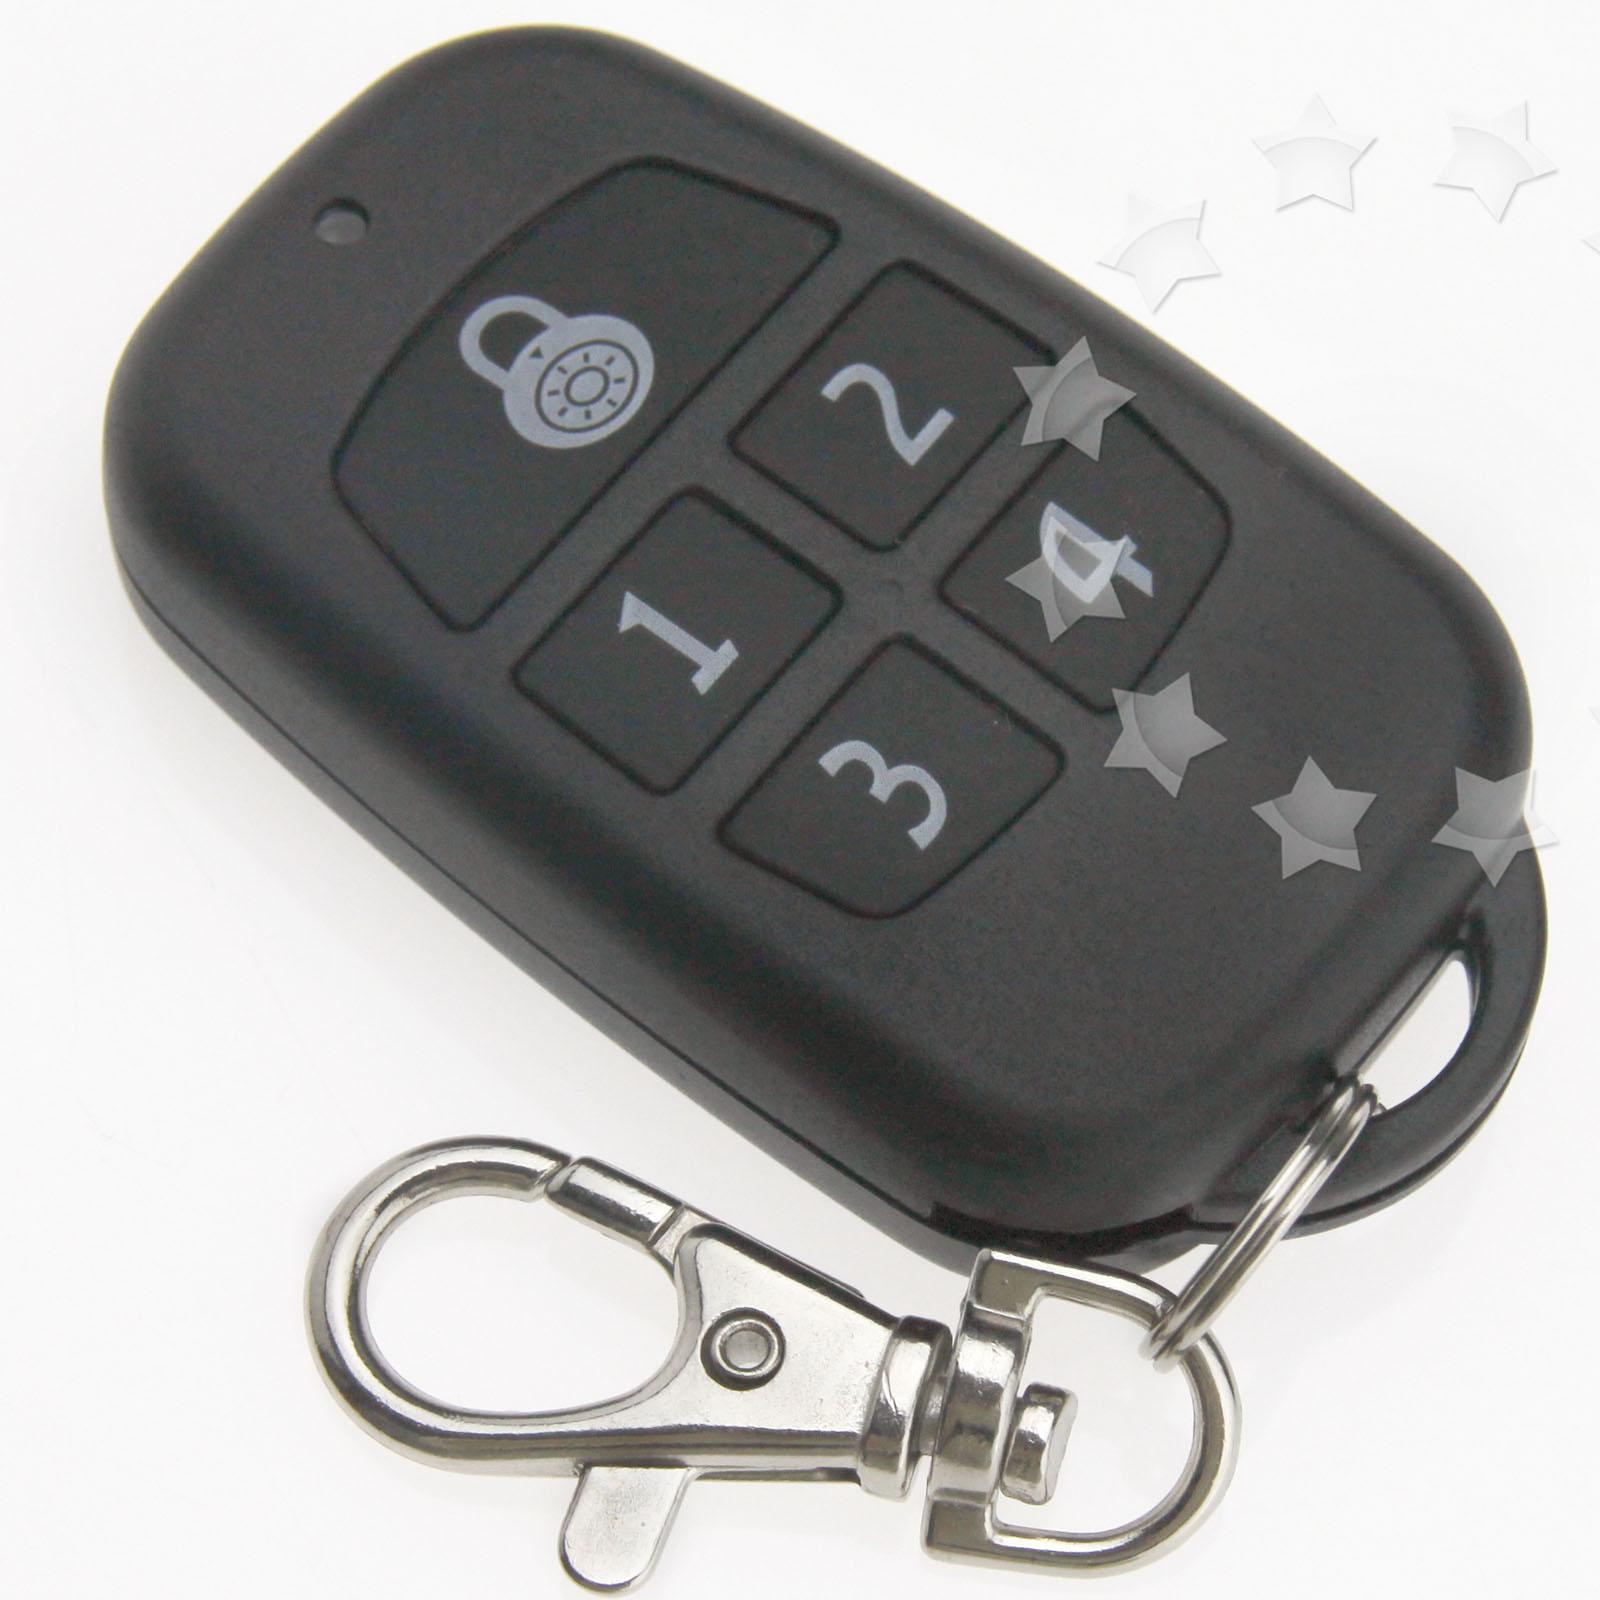 5 Button Multi Frequency Garage Door Remote Control Duplicator